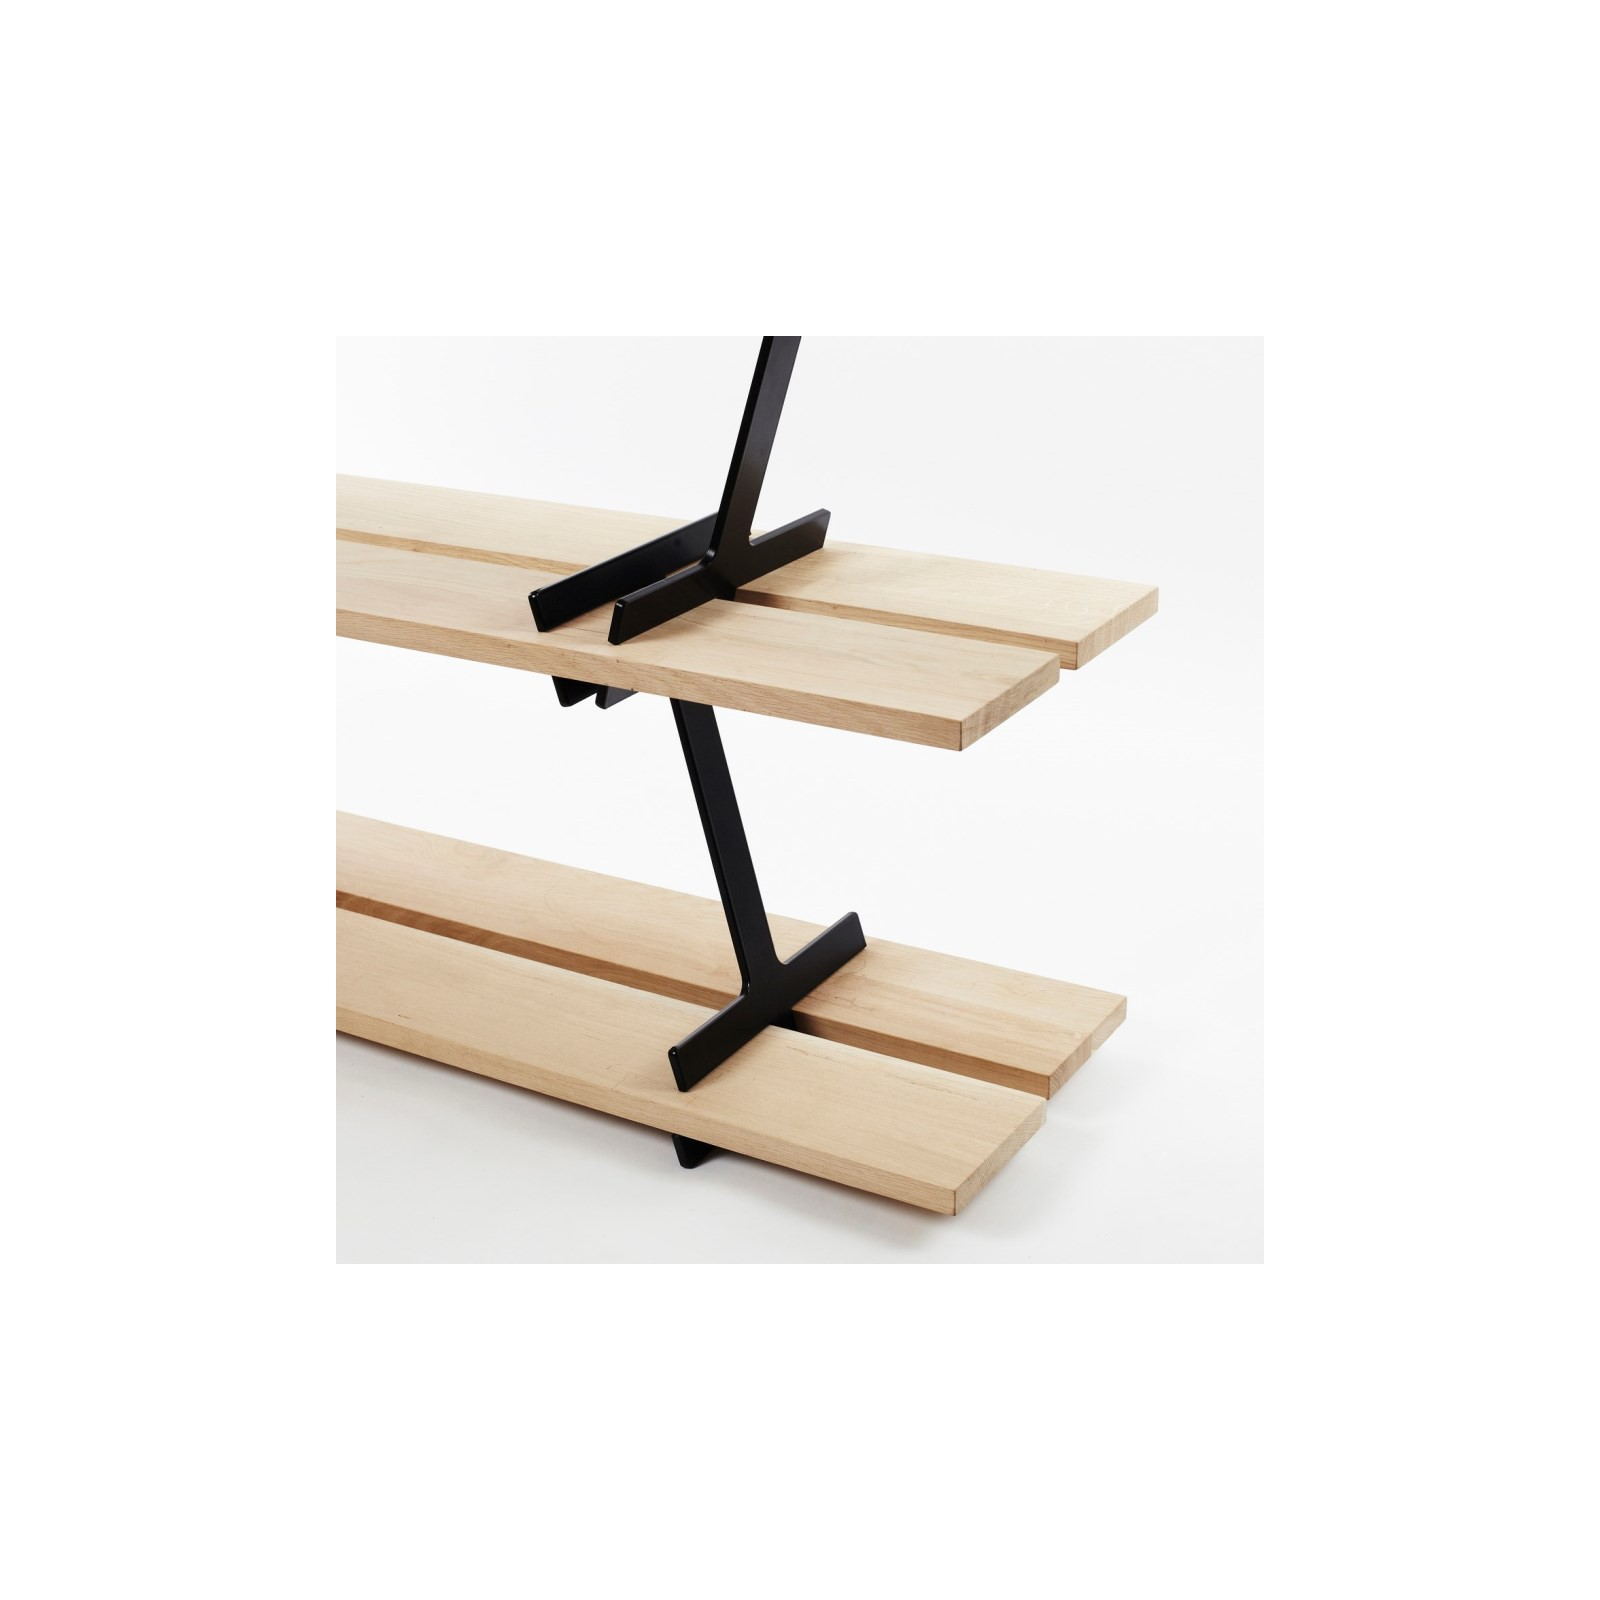 etag re grand ecart noire arne concept. Black Bedroom Furniture Sets. Home Design Ideas